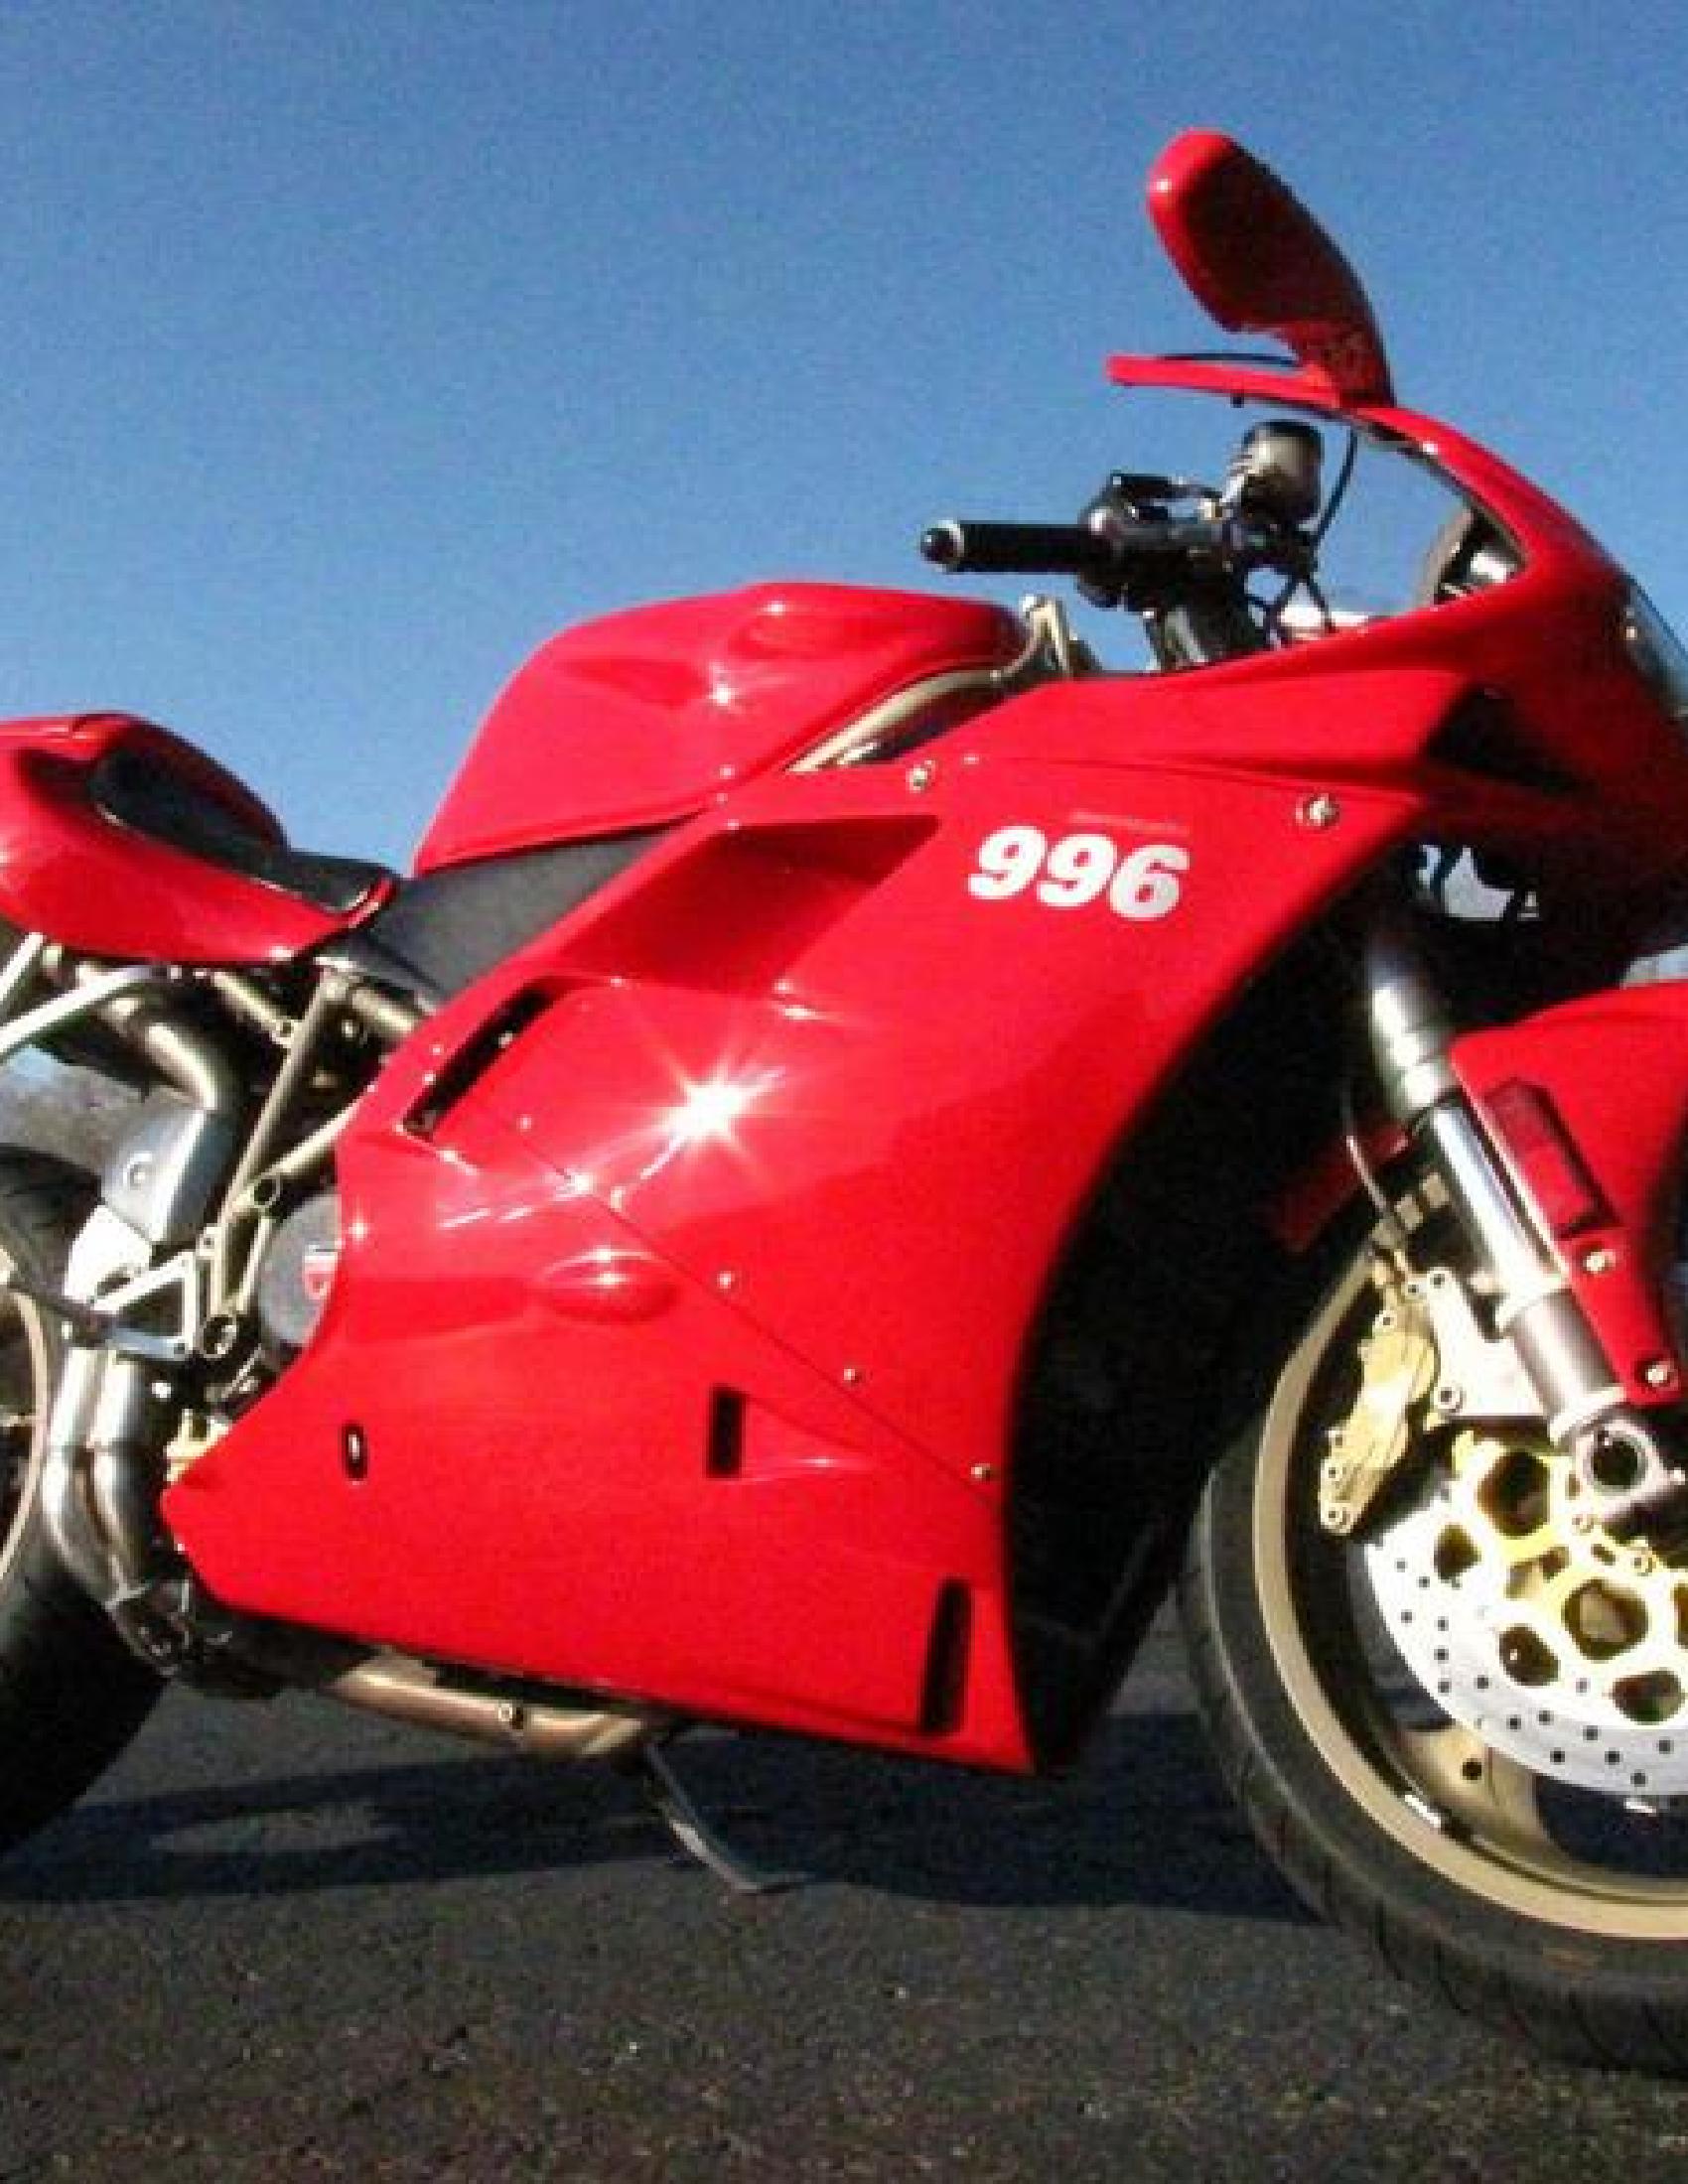 Ducati 996 Motorcycle manual